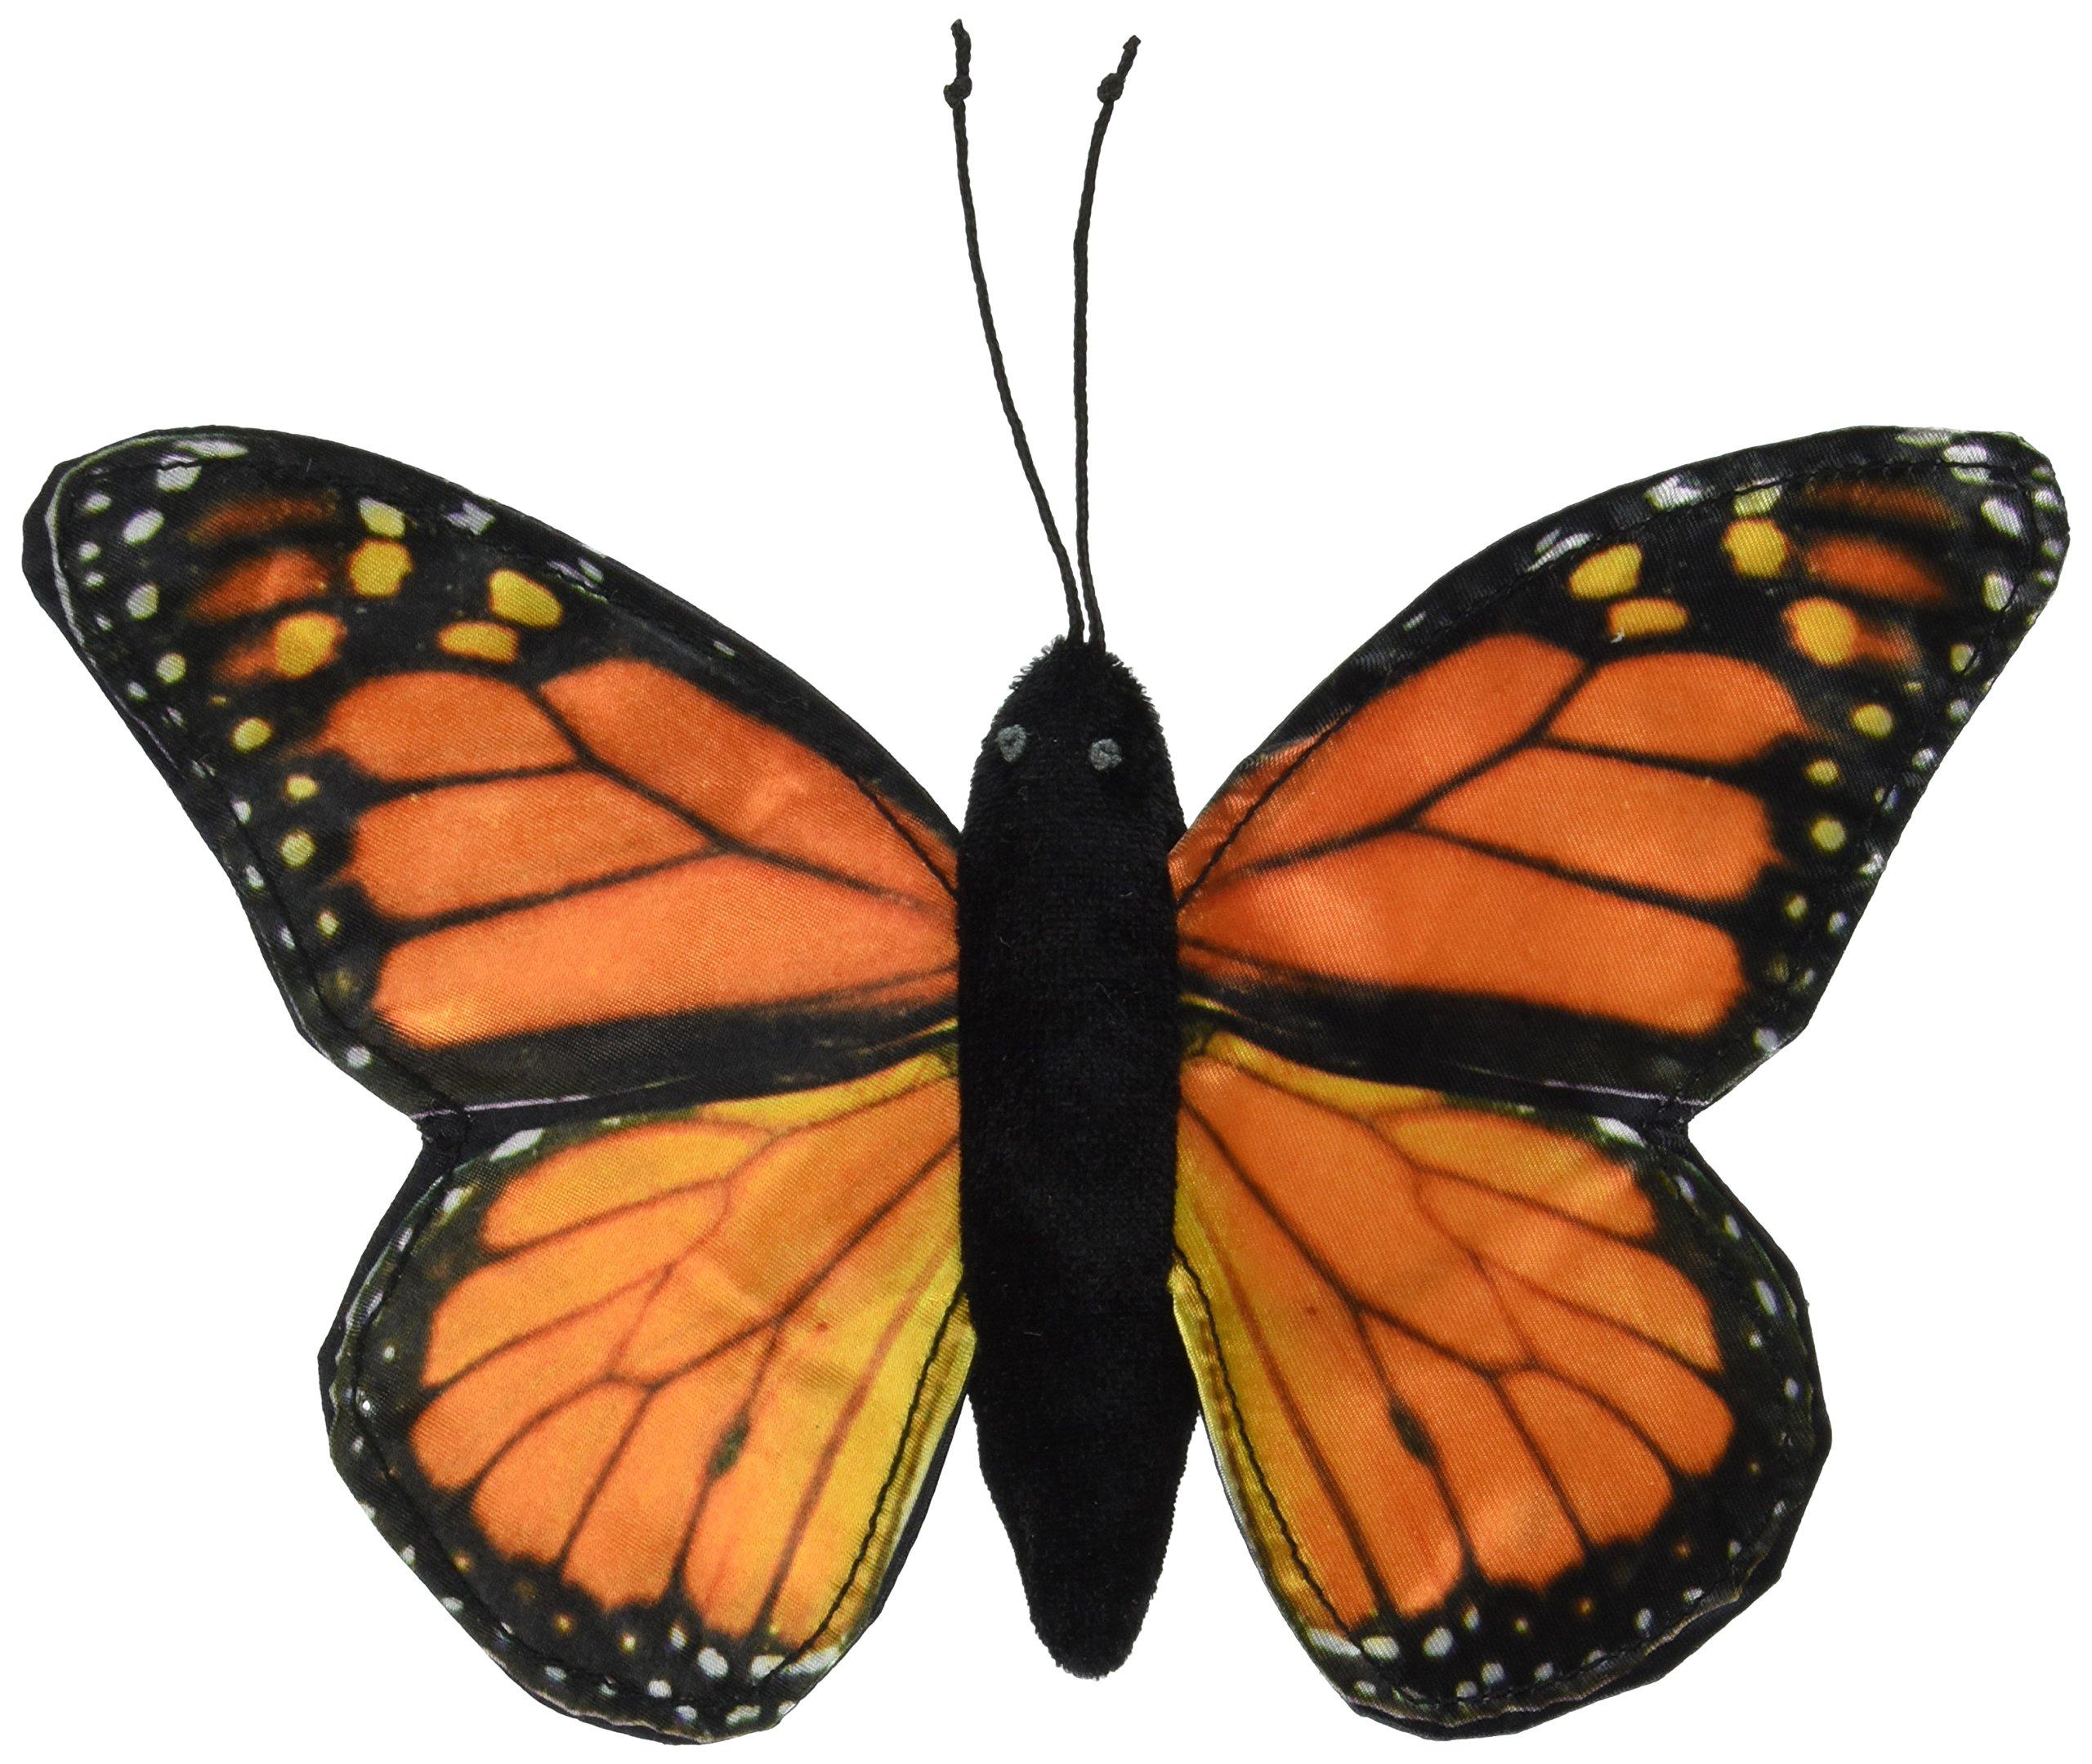 Sunny toys 8'' Finger Butterfly Monarch Finger Puppet